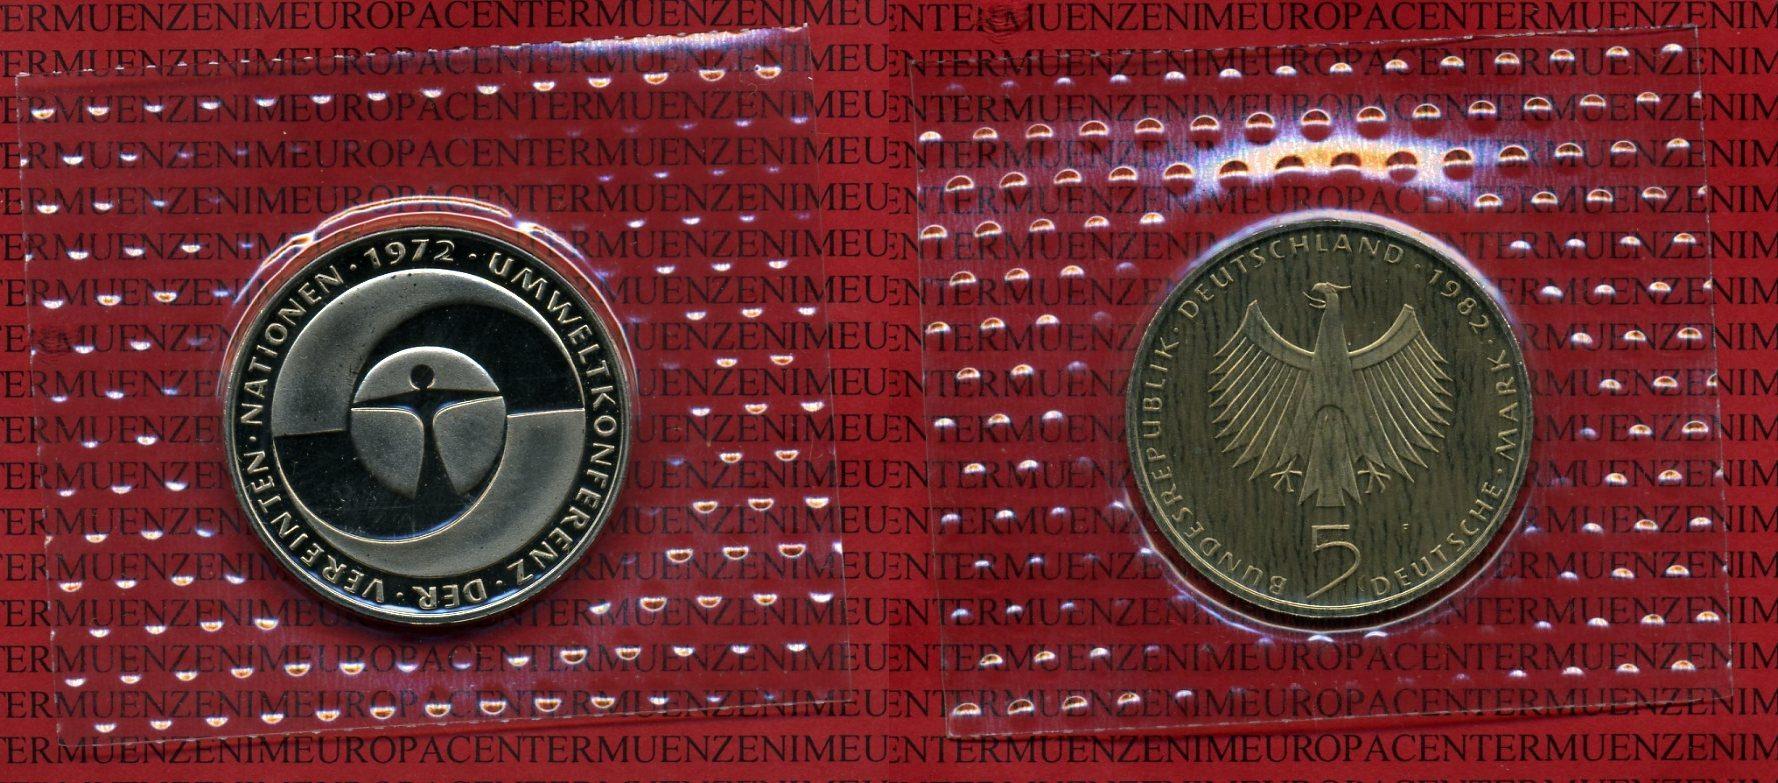 5 Dm Gedenkmünze Cuni 1982 Bundesrepublik Deutschland